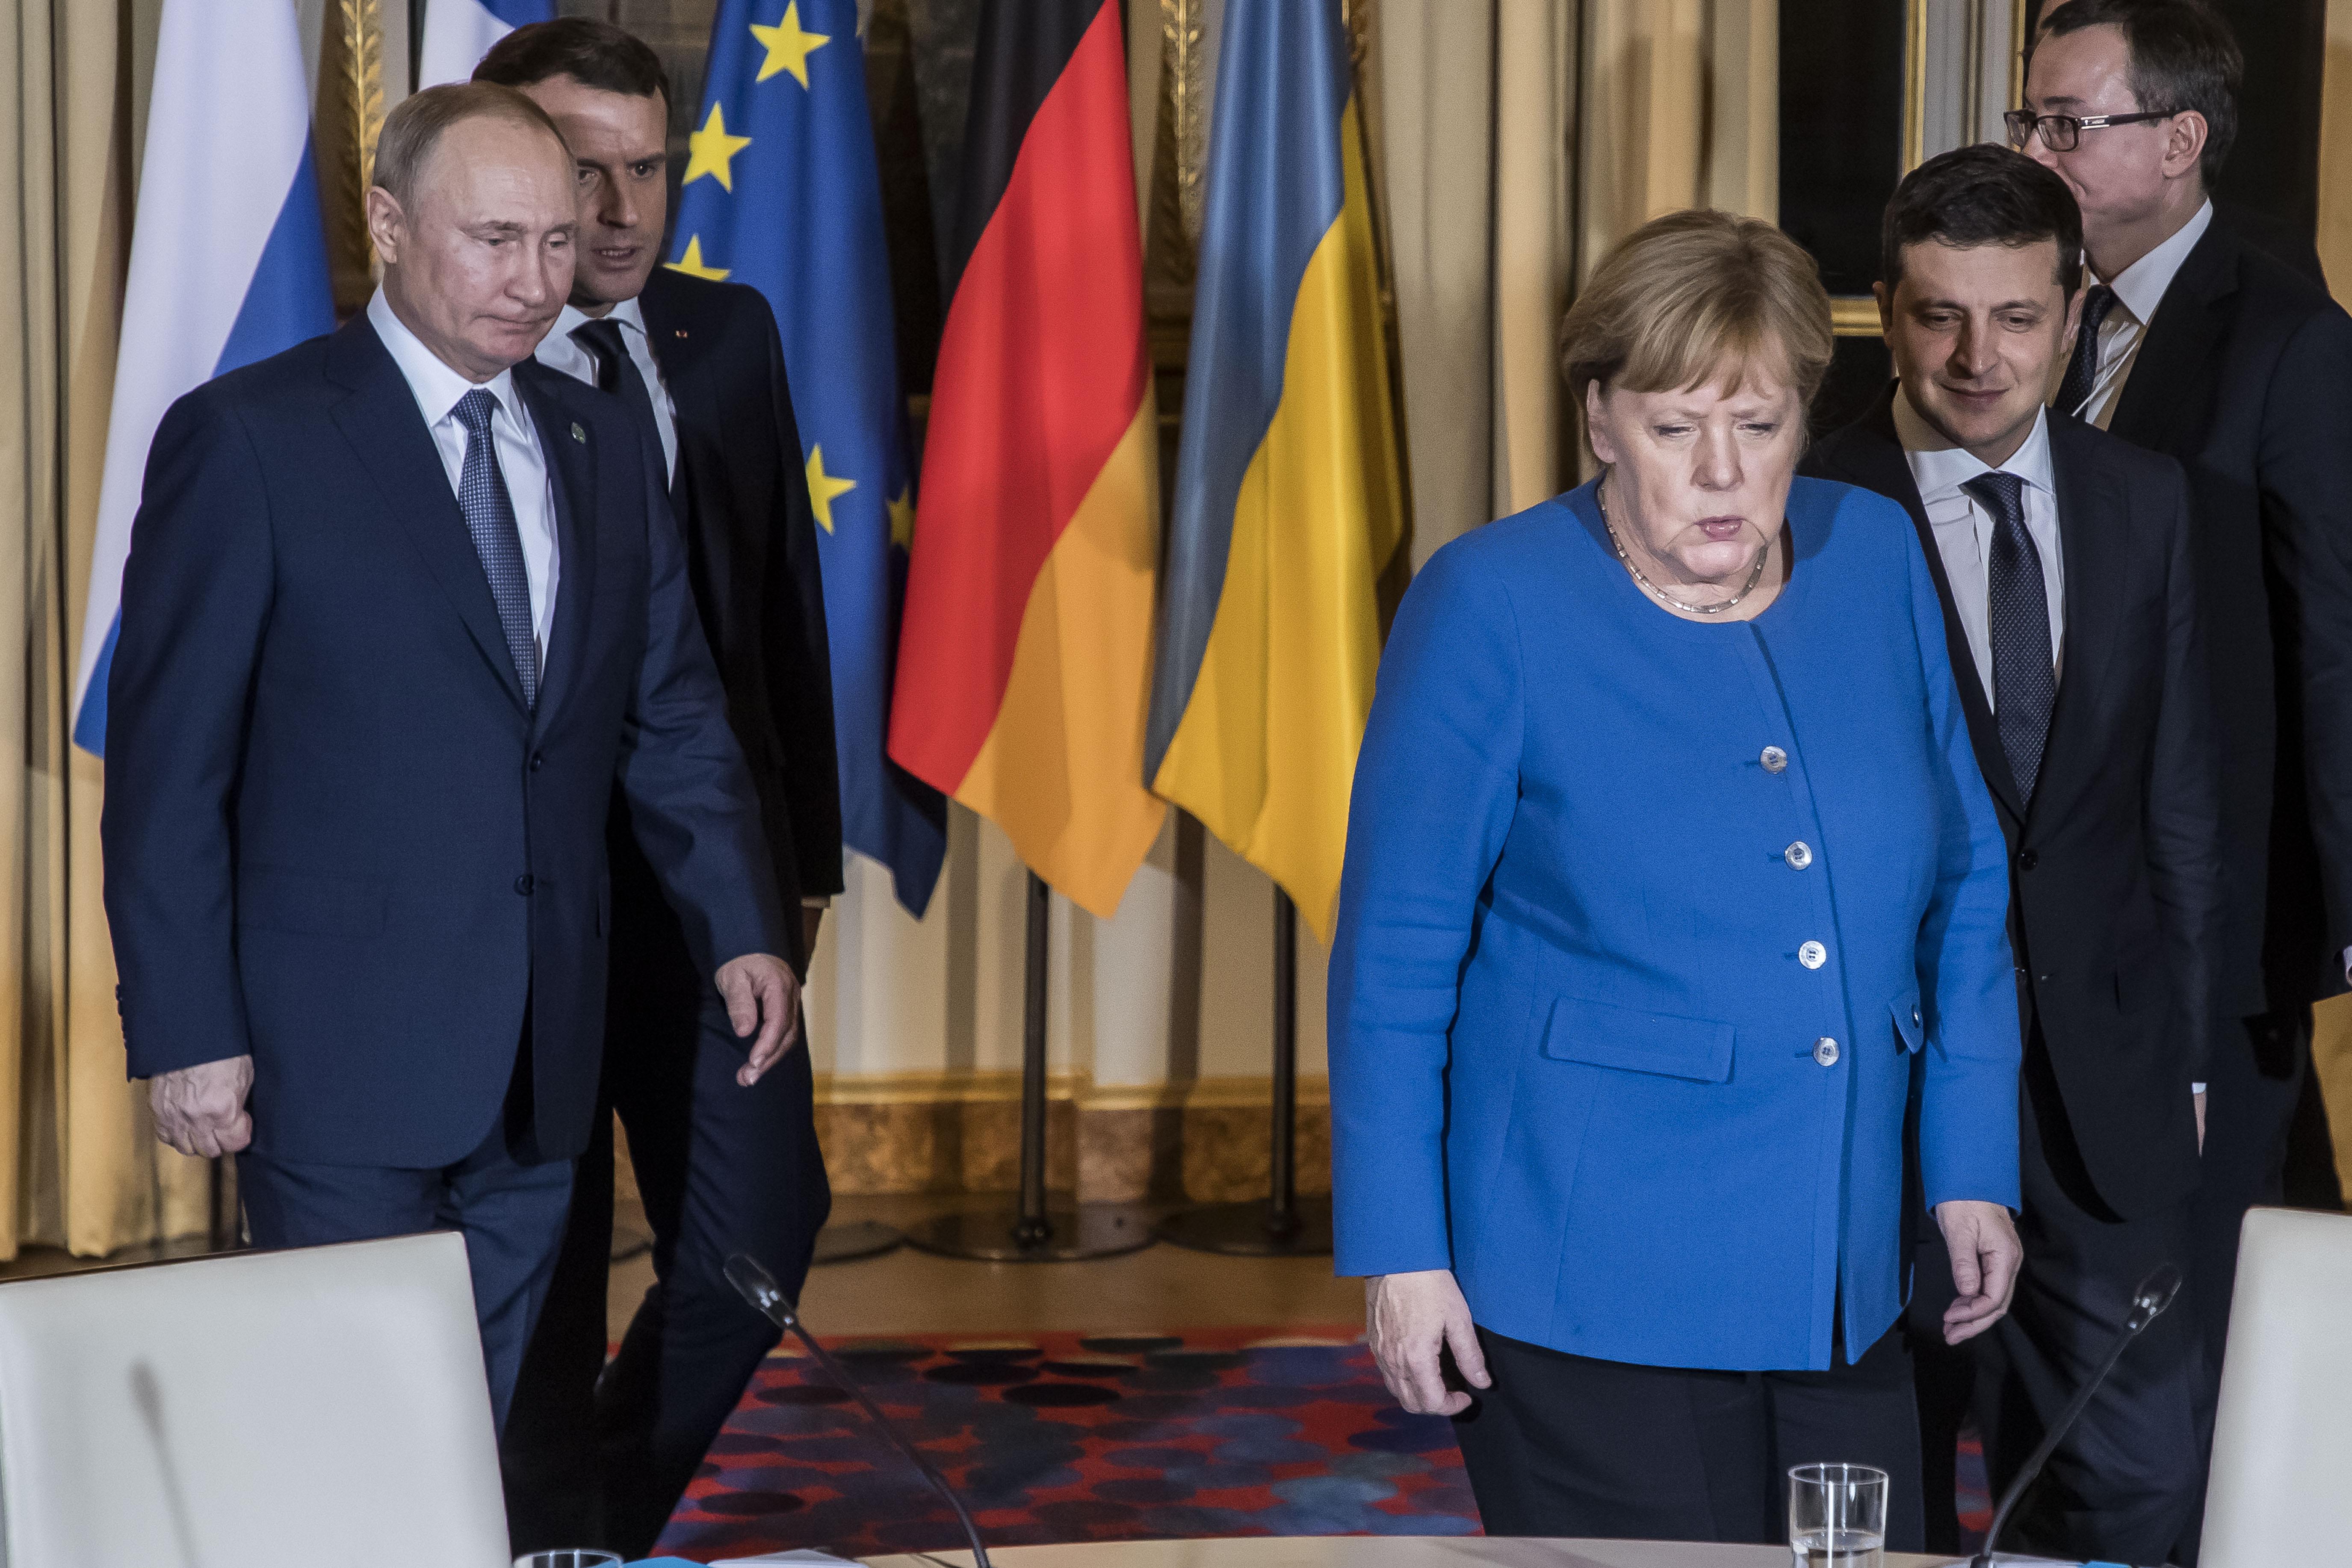 Russia Retaliates by Expelling Two German Diplomats Over Berlin Murder Probe